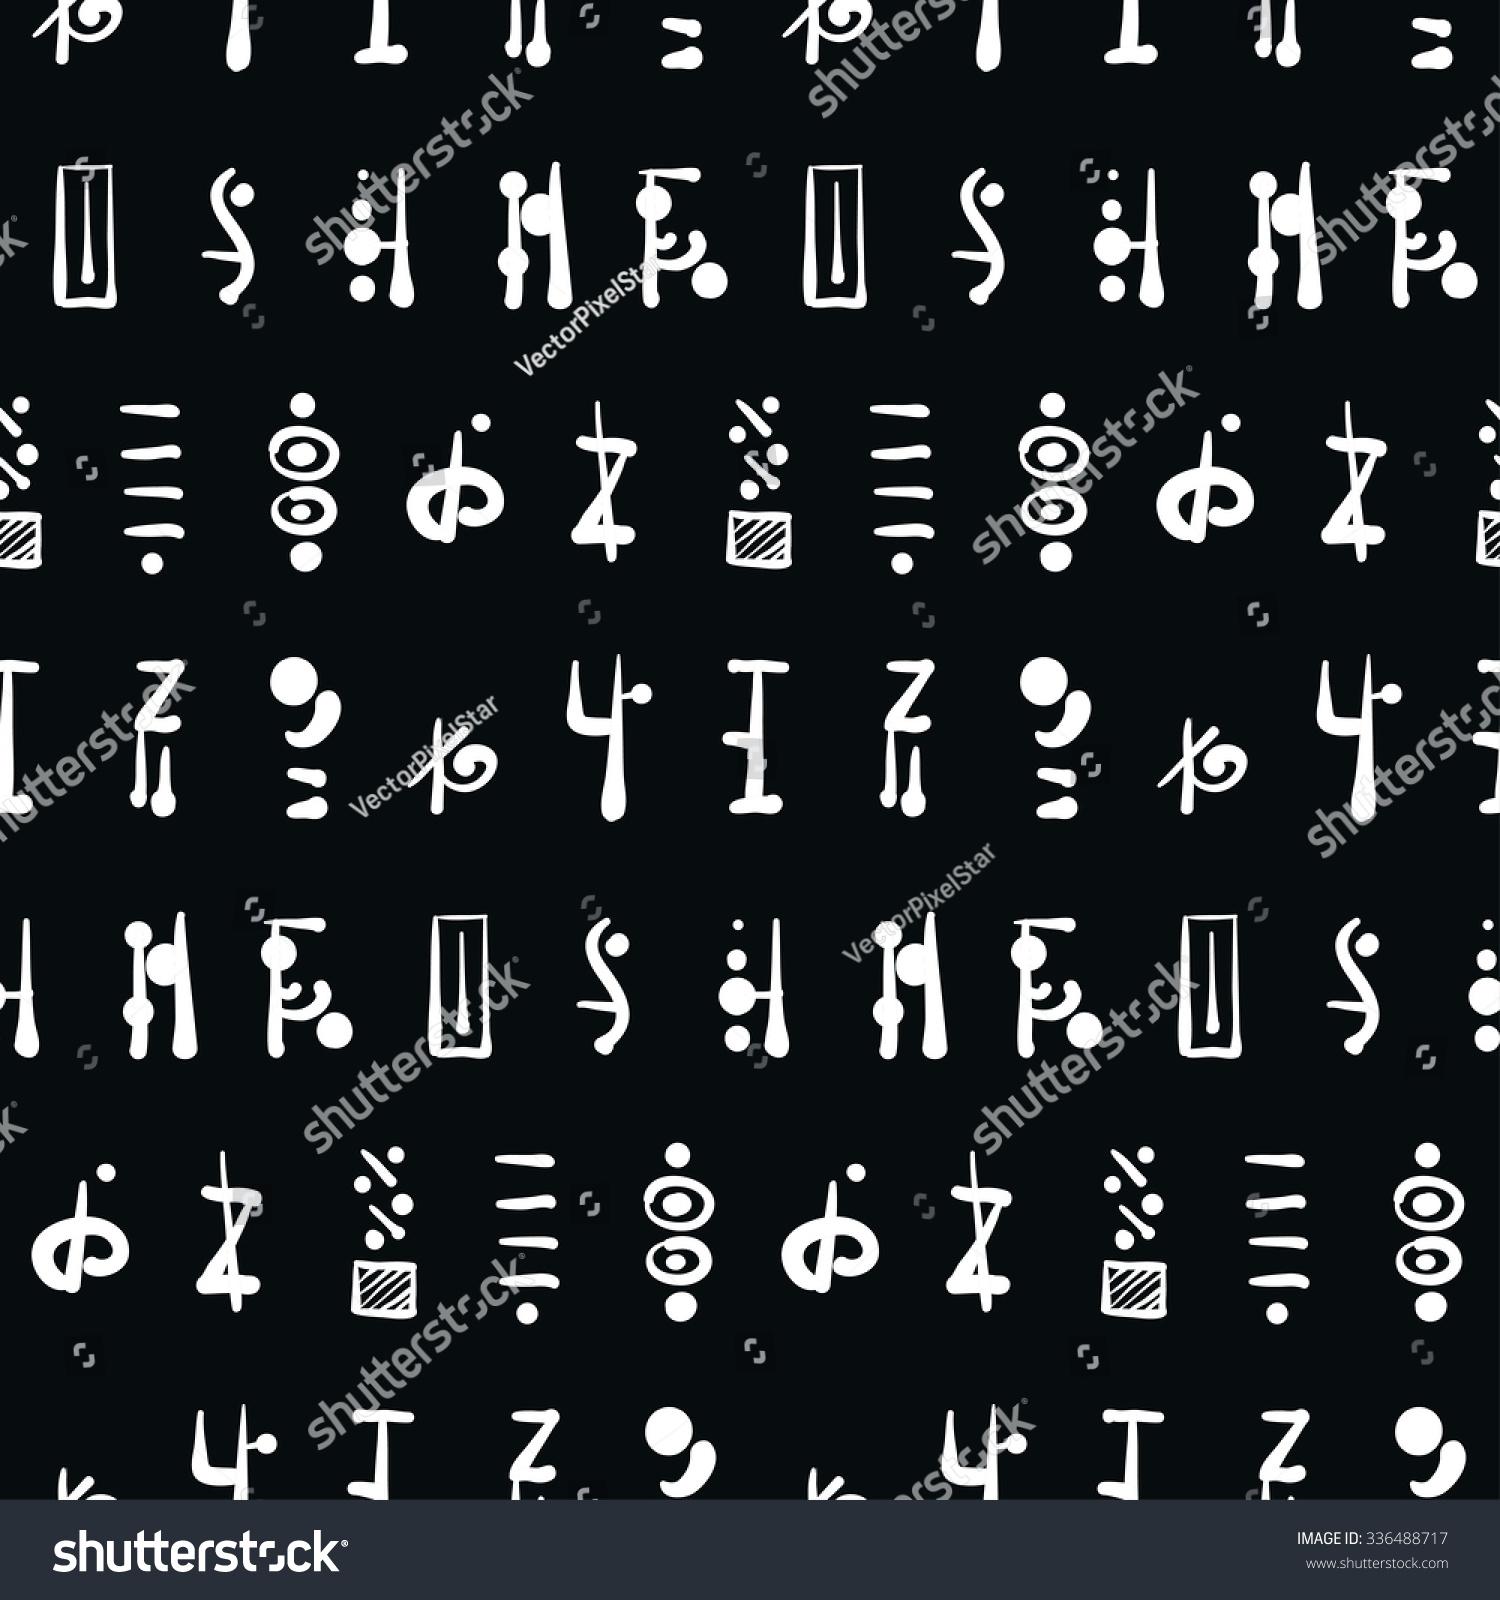 Alien Symbols Black White Vector Seamless Stock Vector Royalty Free